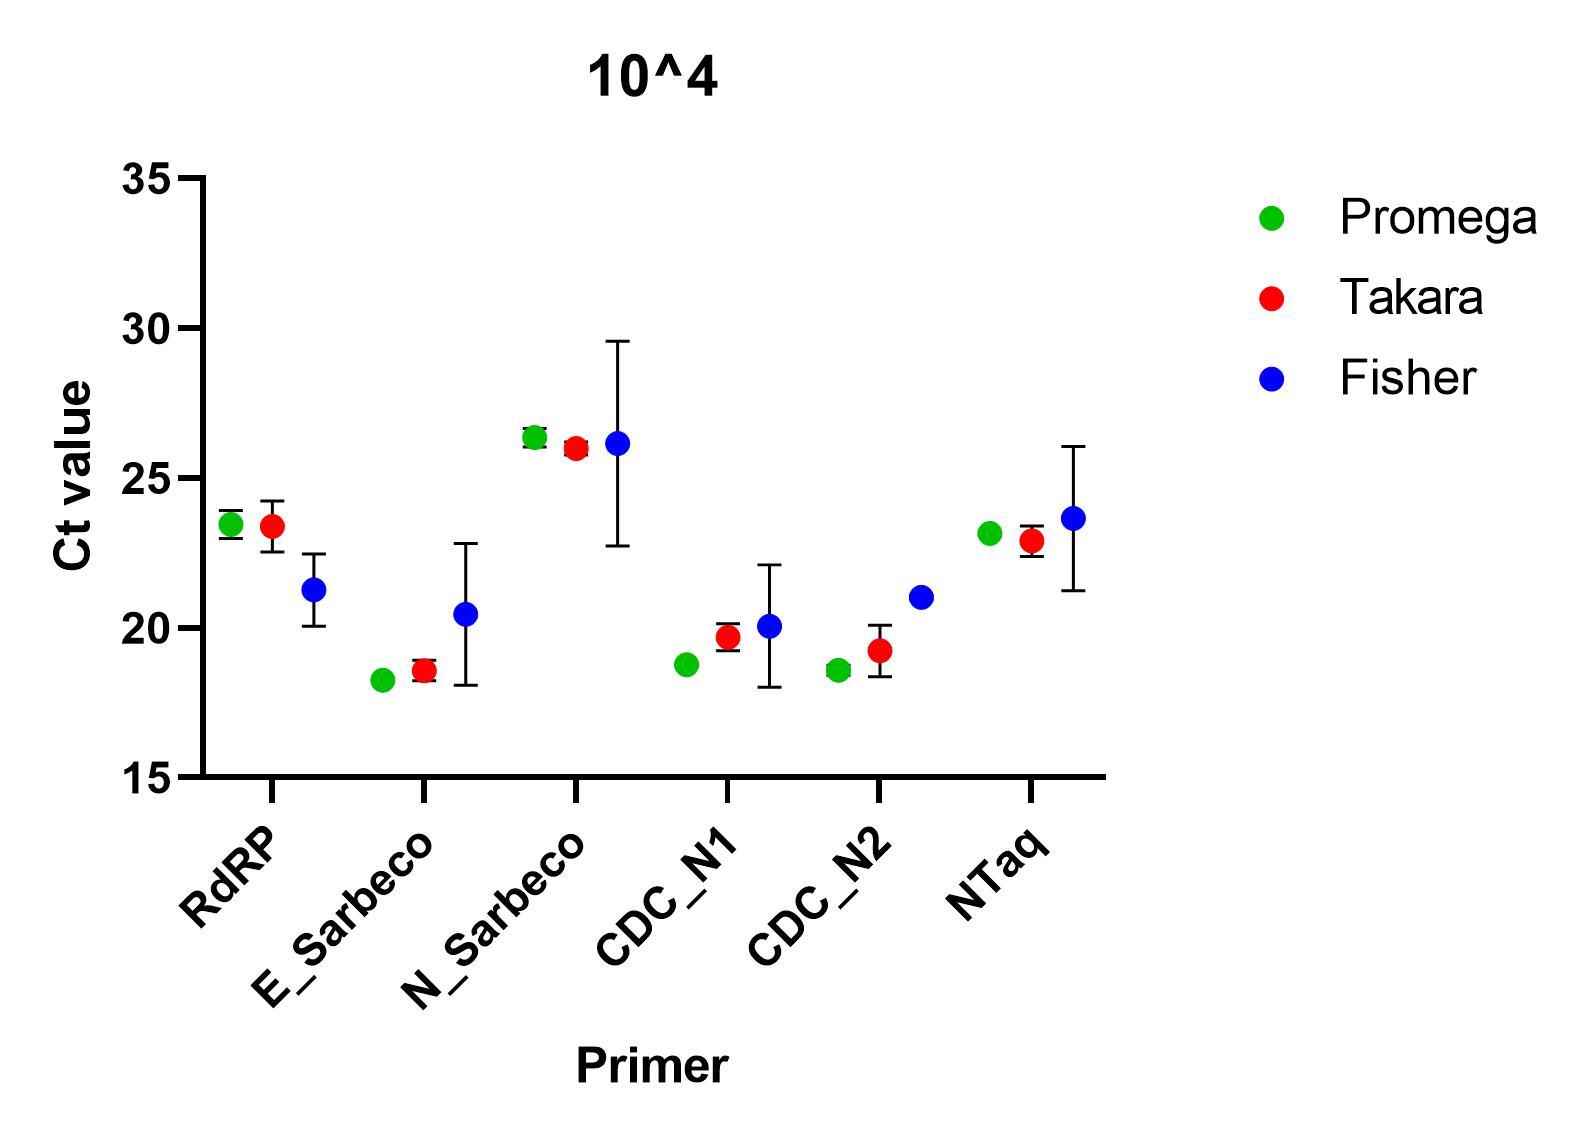 Primers tested at 10^4 SARS-CoV-2 standard